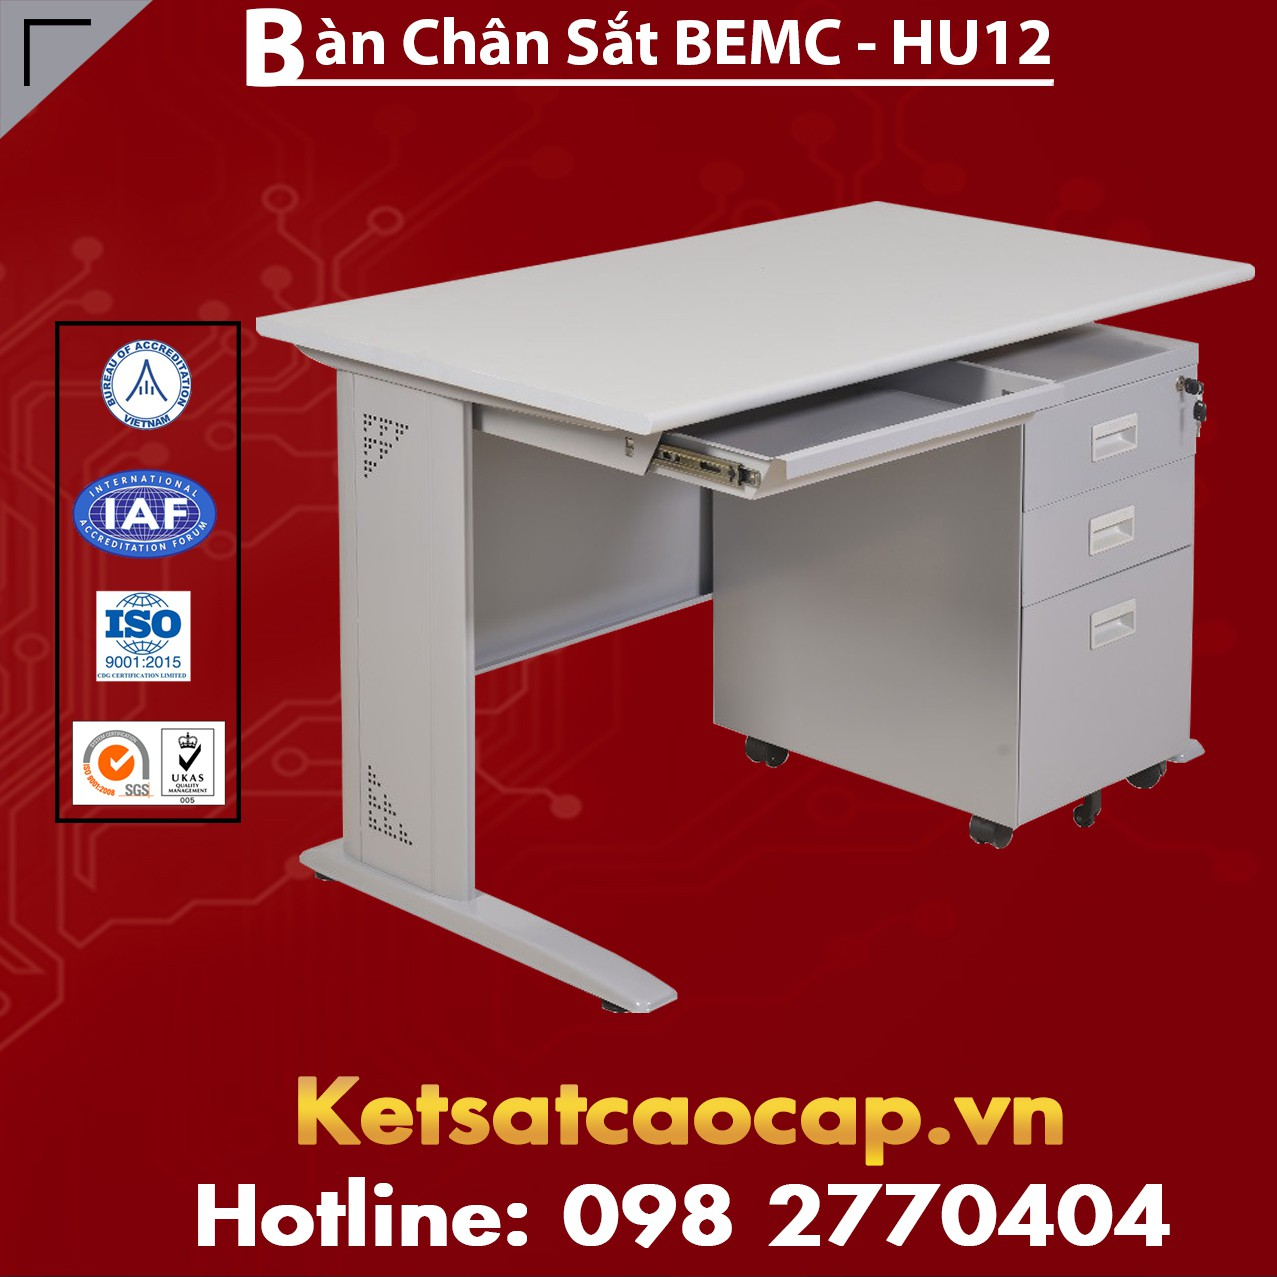 Bàn Chân Sắt BEMC - HU12